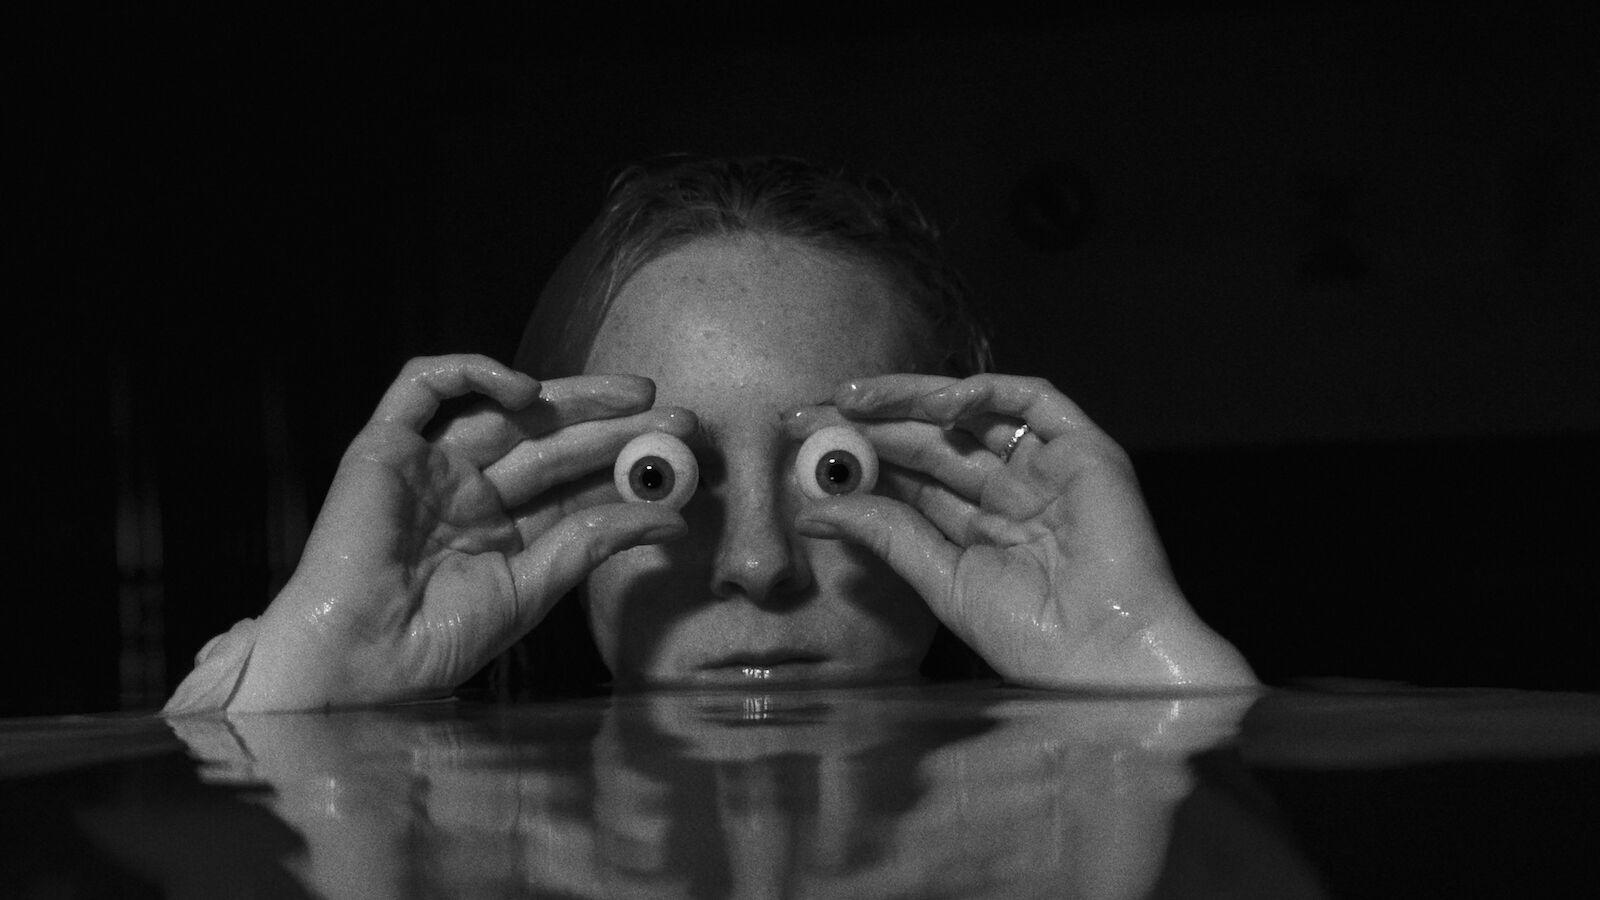 Clea van der Grijn, JUMP - Mermaid Selects - Pool 300dpi WEB.jpeg.jpg